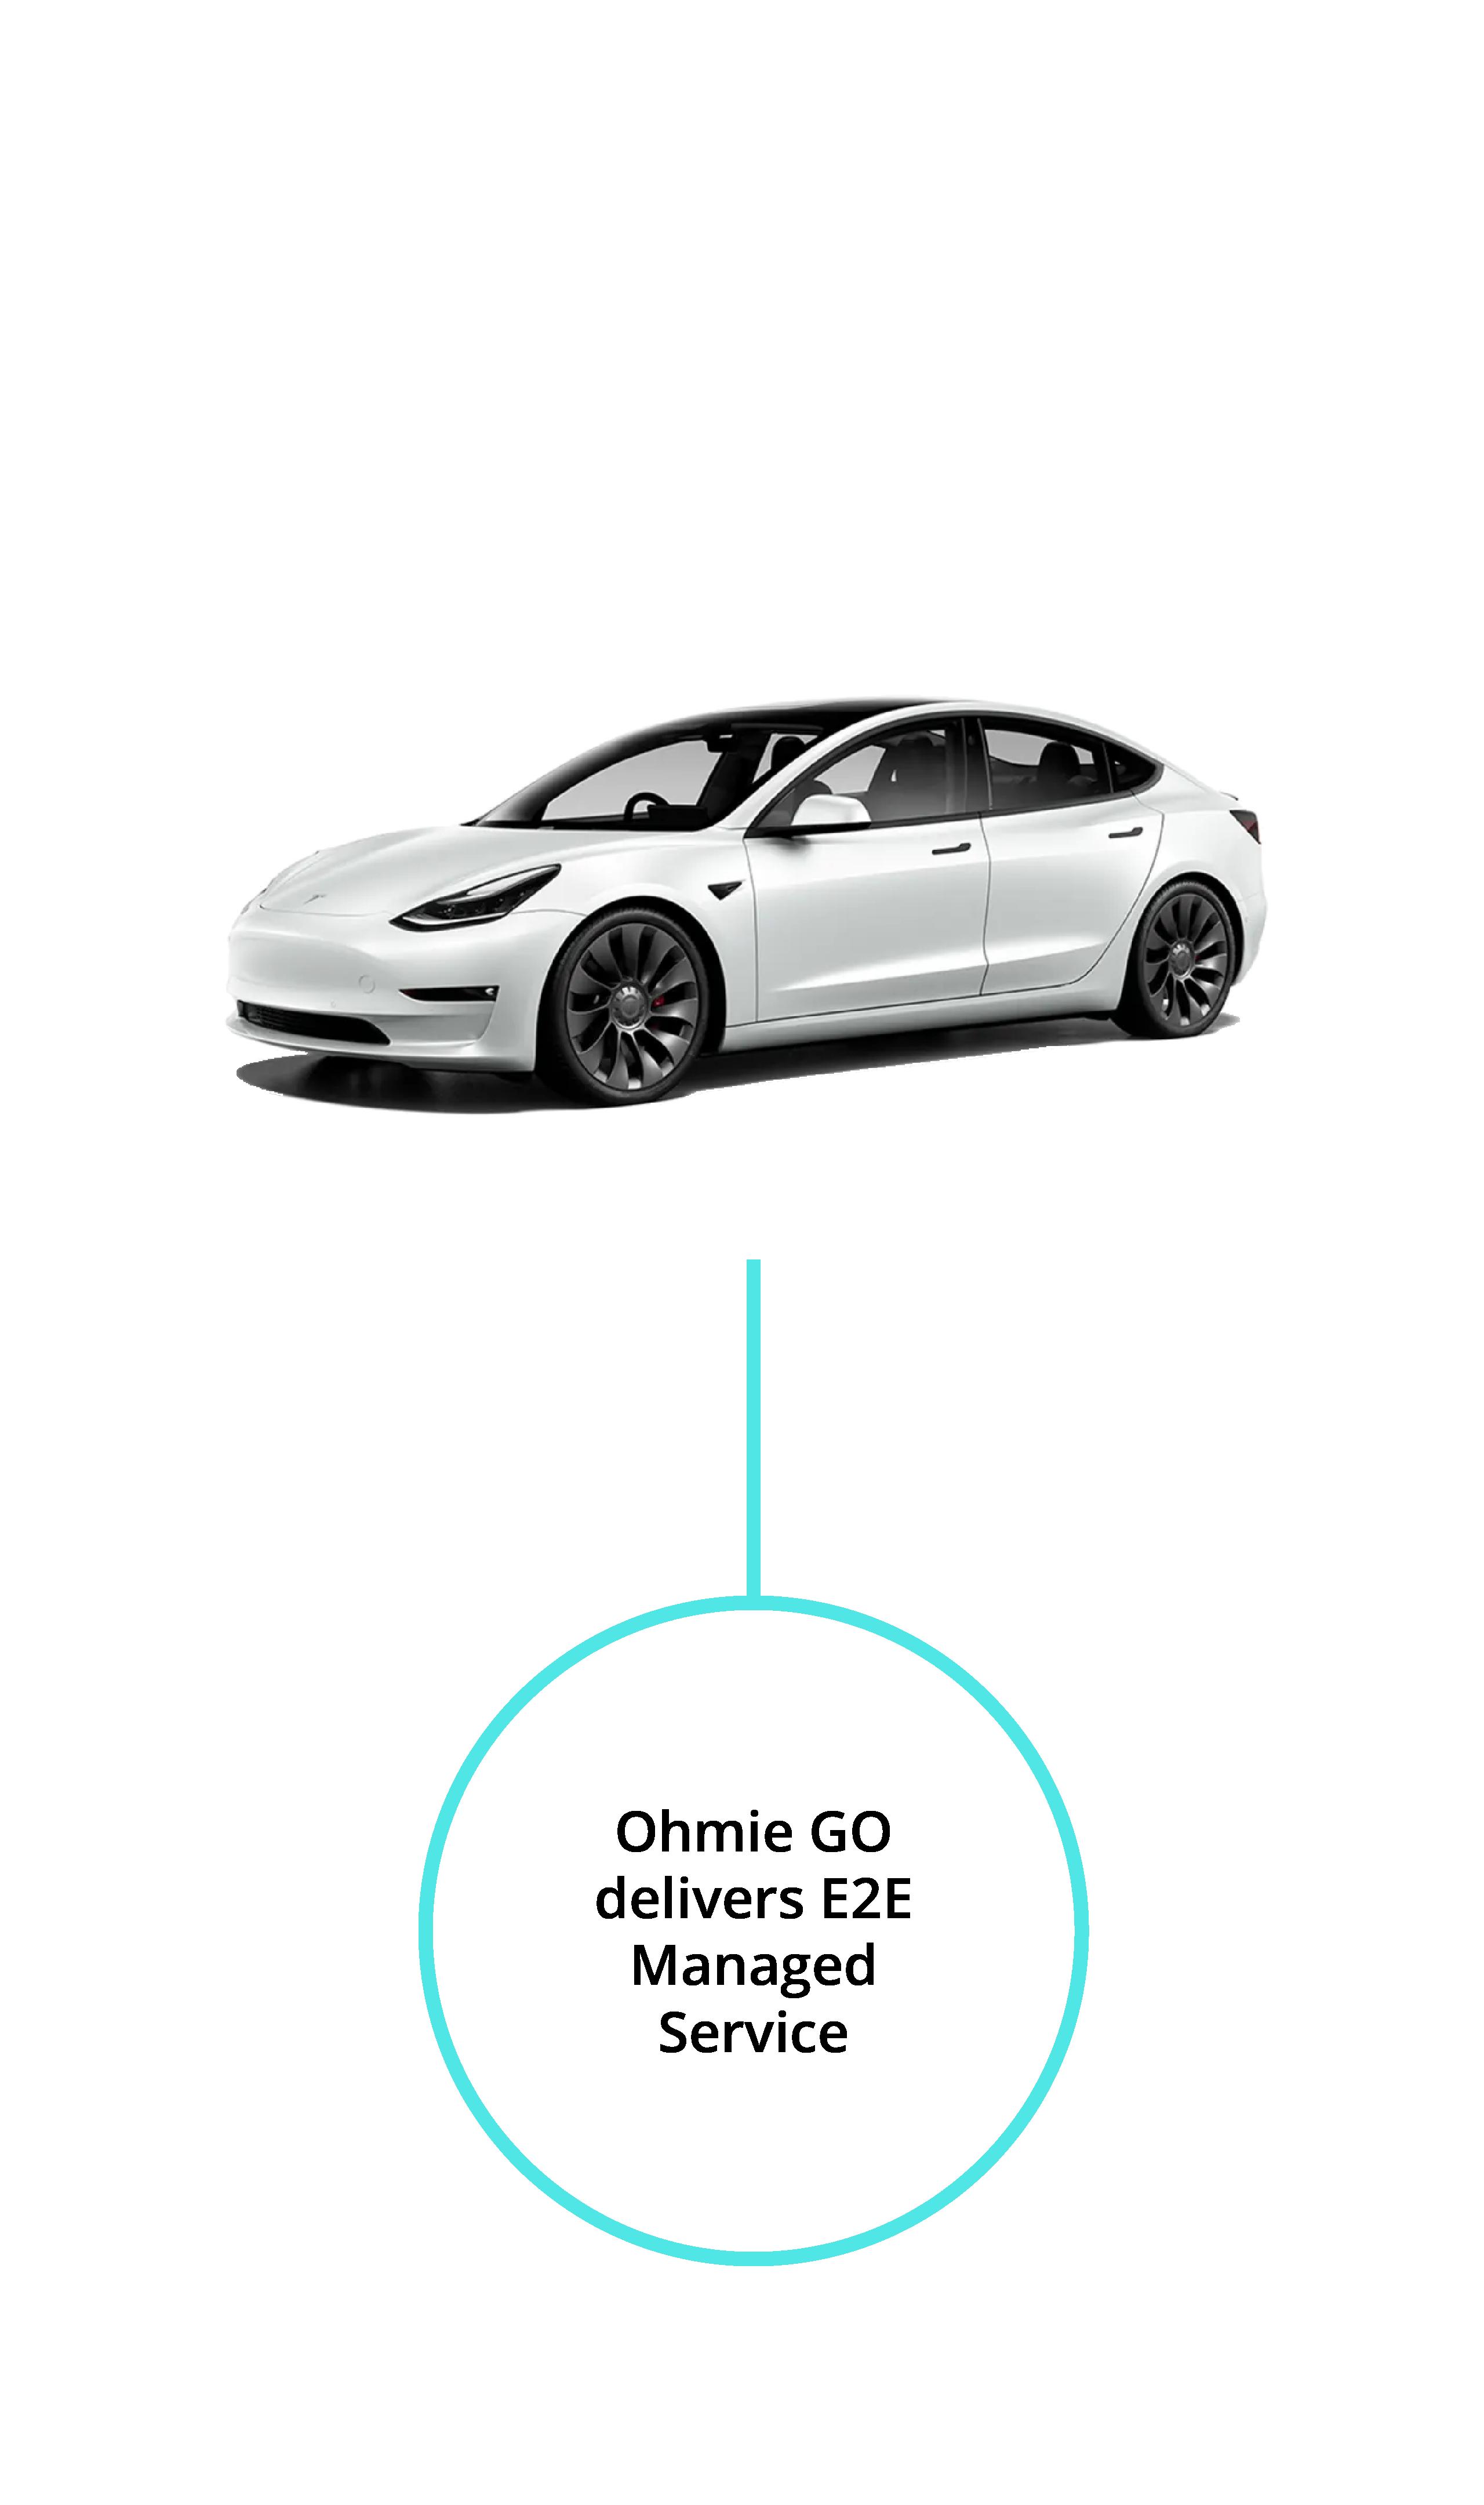 Ohmie GO Delivers E2E Managed Service below Tesla Model 3